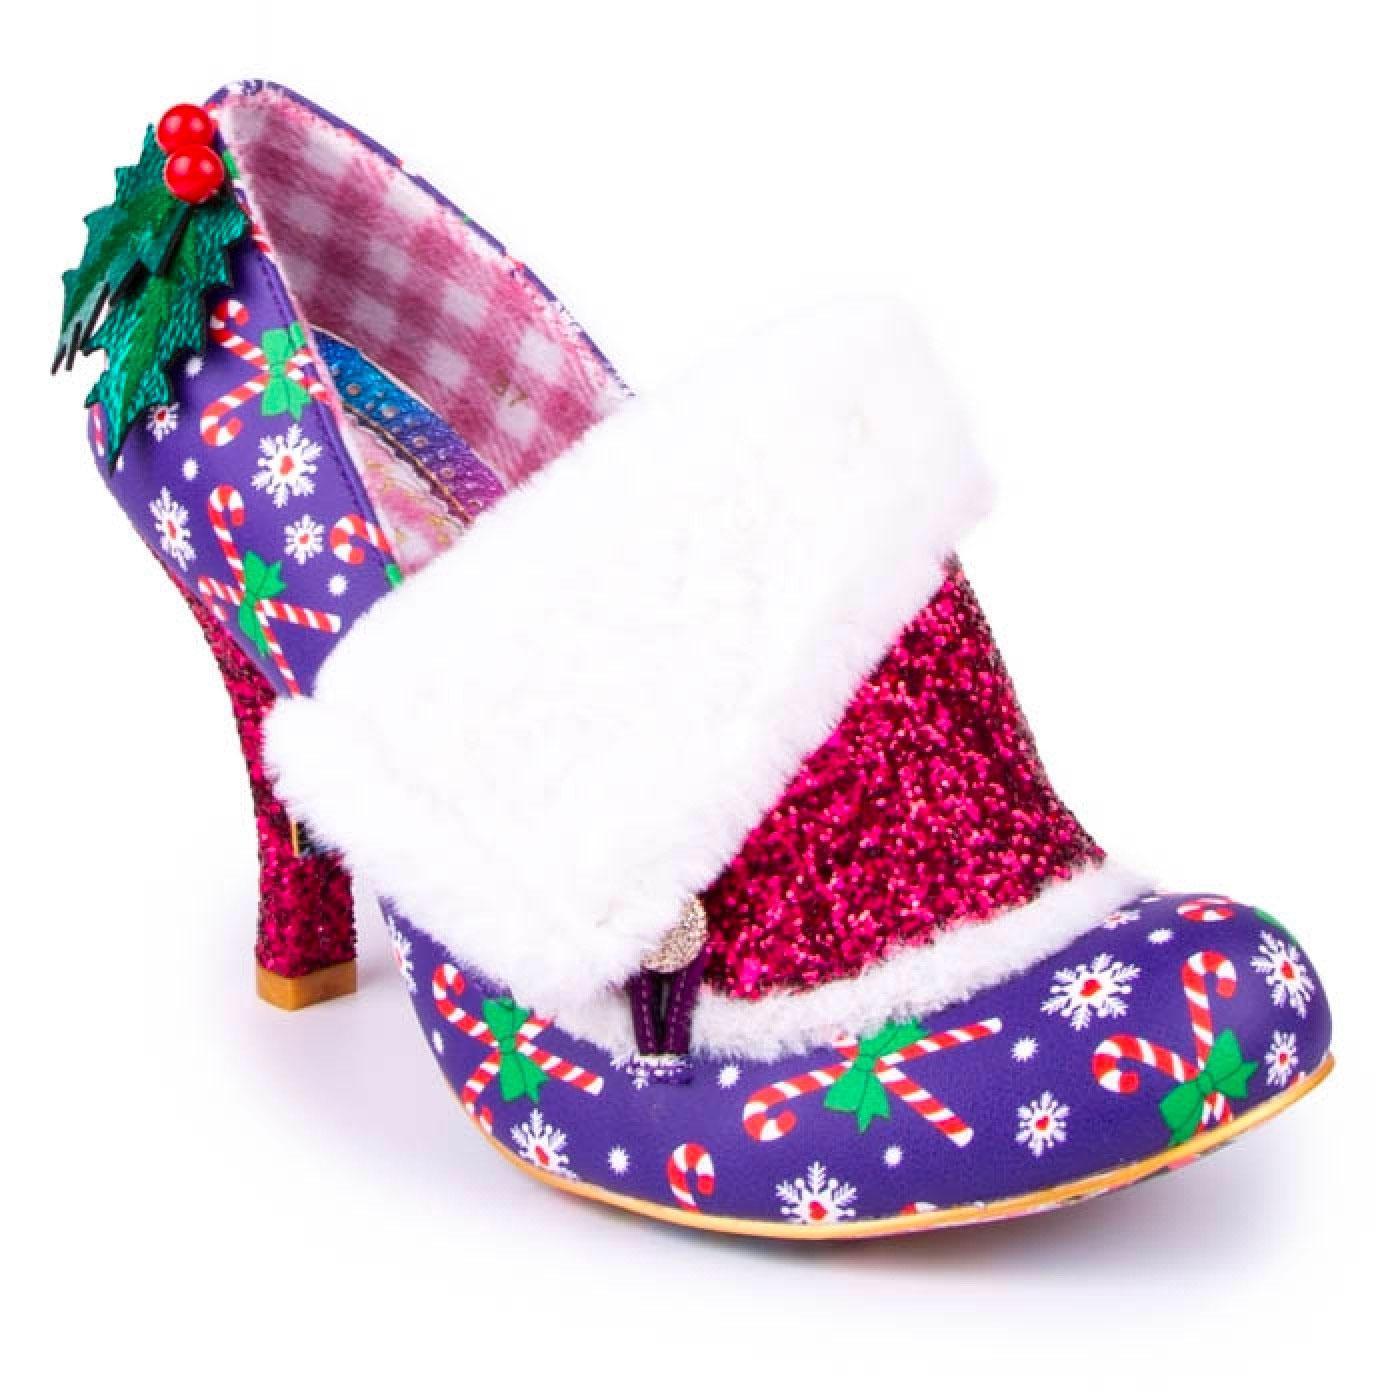 Festive Flack IRREGULAR CHOICE Christmas Shoes